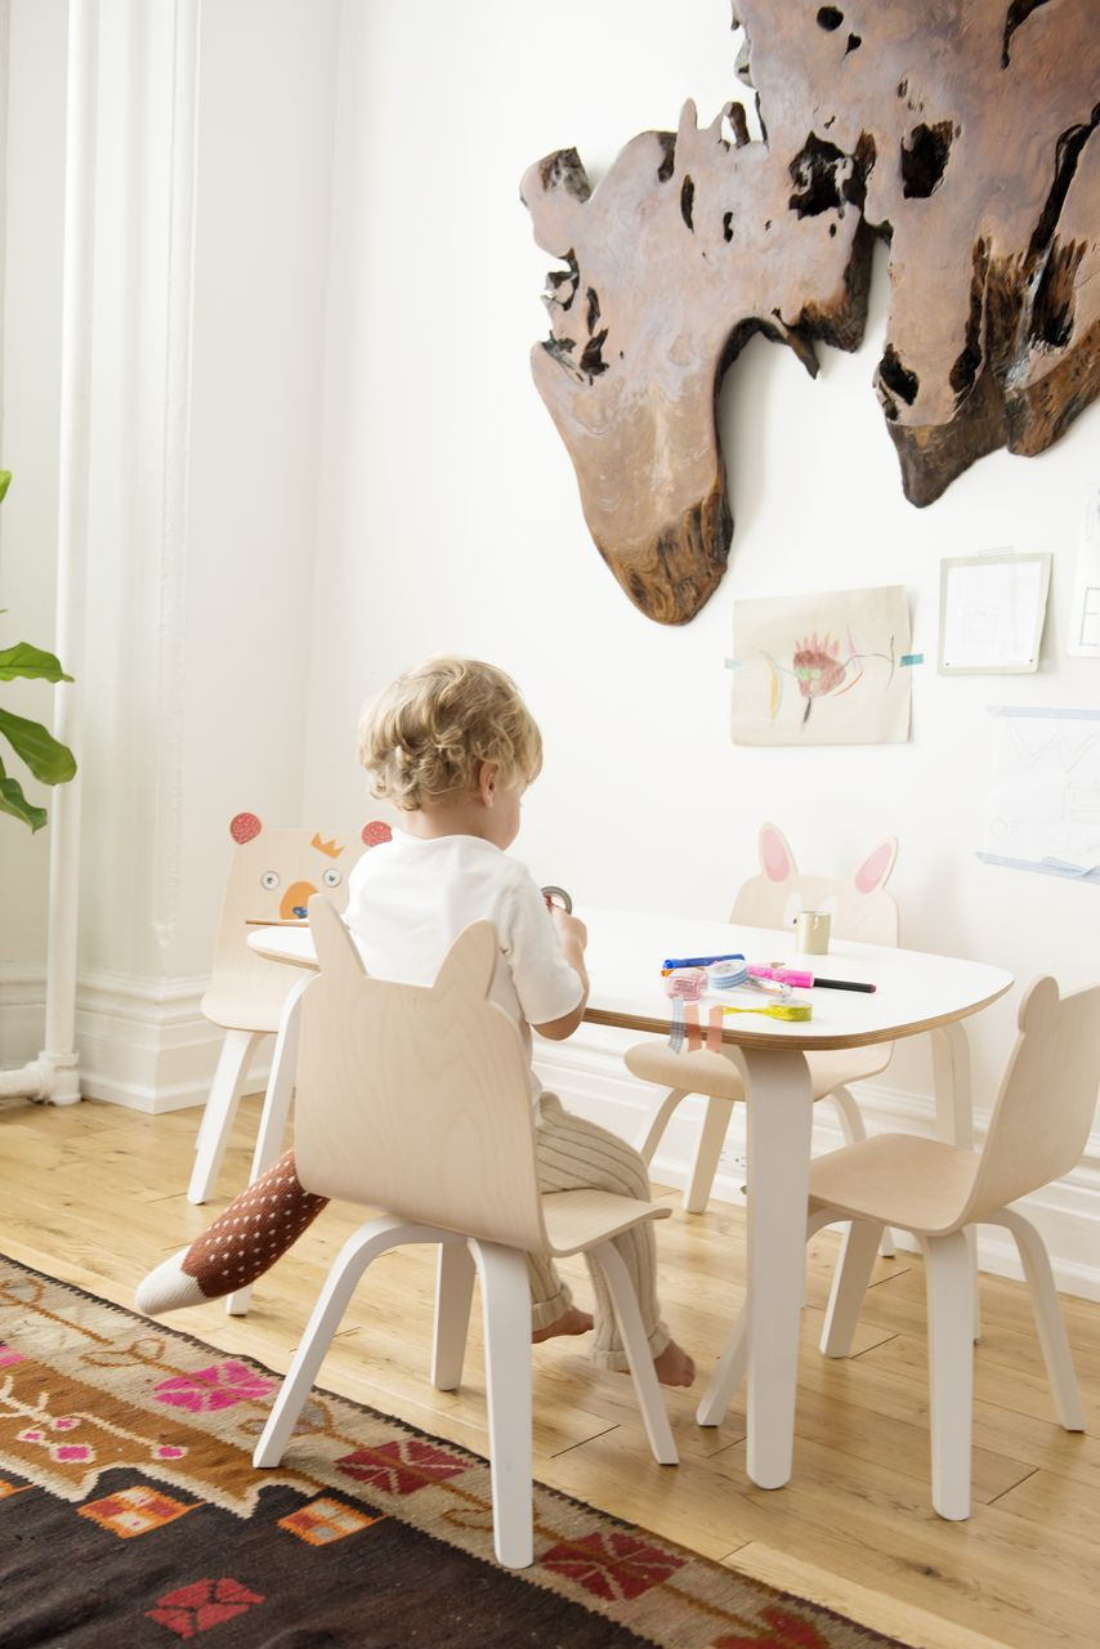 oeuf kindertisch wei kinderst hle tische kinderzimmerm bel kinderzimmer. Black Bedroom Furniture Sets. Home Design Ideas